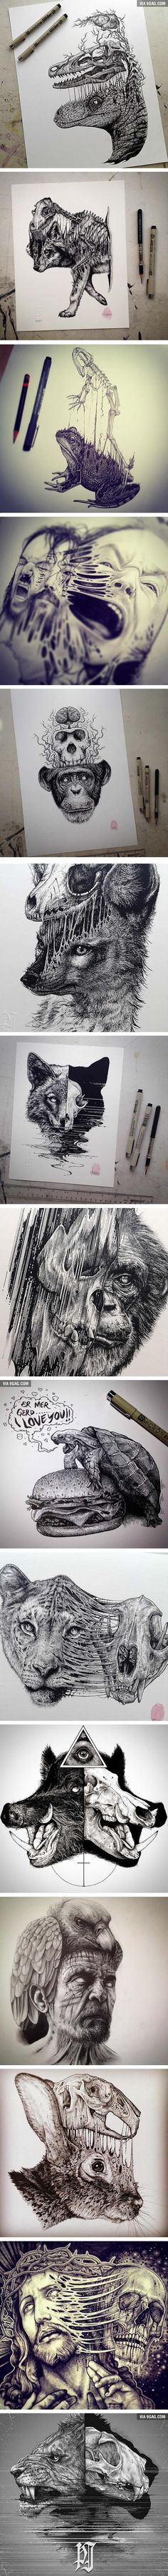 Animals Leave Their Skeletons Behind In These Stunning Dark Drawings (By Paul Jackson)                                                                                                                                                      More